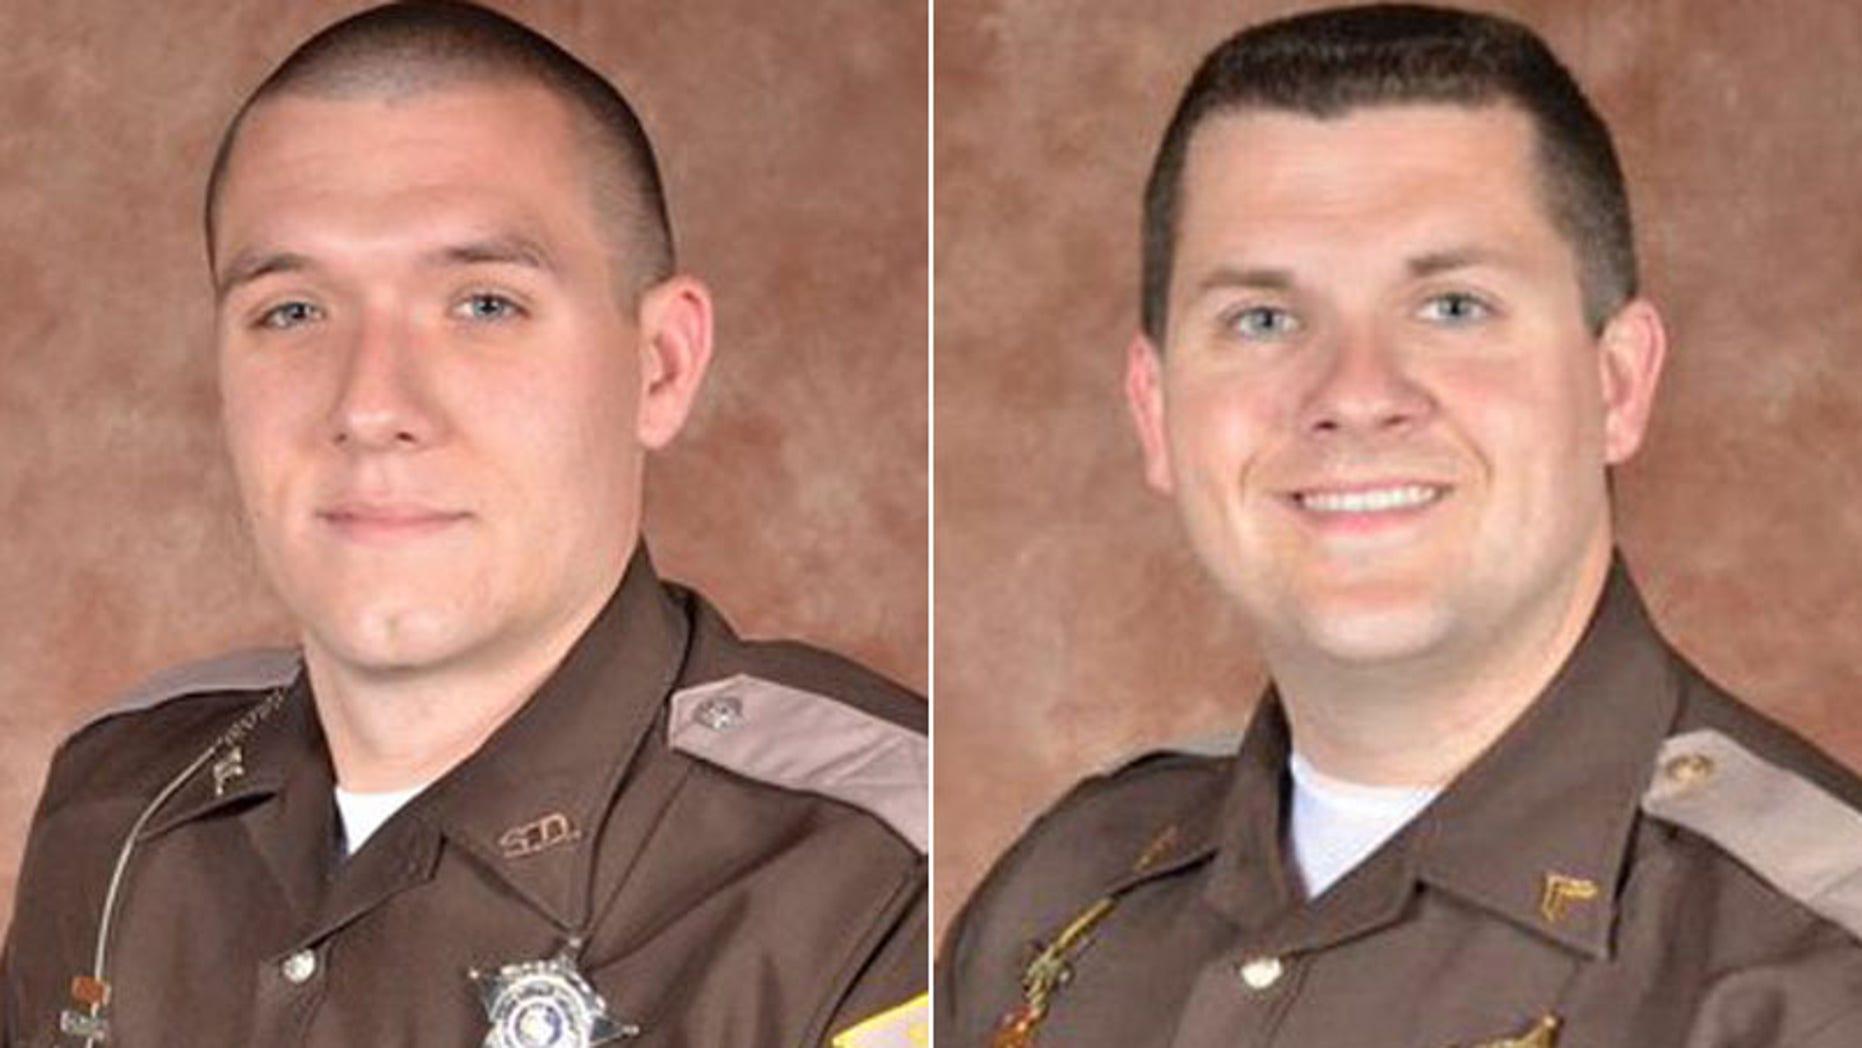 Deputy Carl Koontz, left, and Sergeant Jordan Buckley were shot while serving a warrant on Sunday.